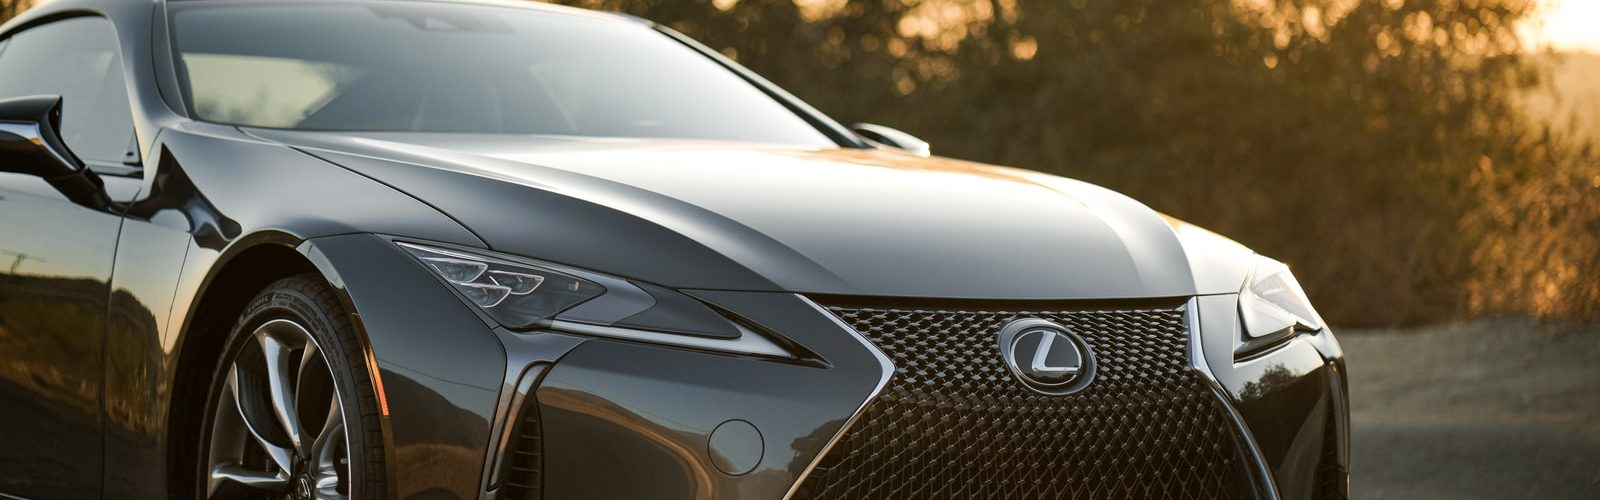 Lexus LC 500 zwart